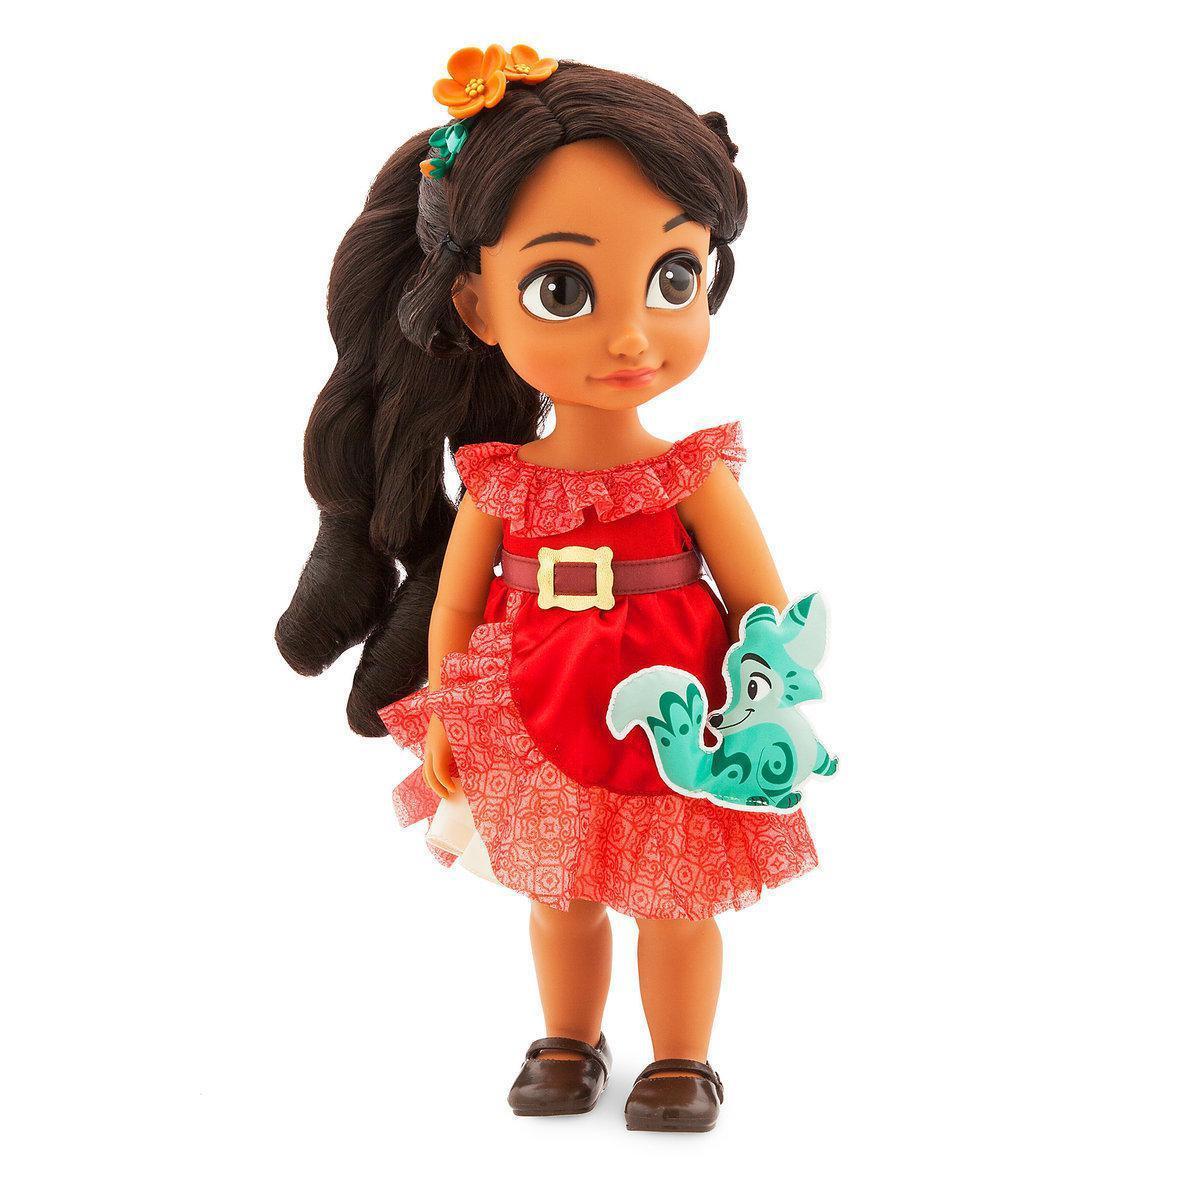 "Лялька Дісней аніматор Олена з Авалора Disney Animators' Collection Elena of Avalor Doll - 16"""